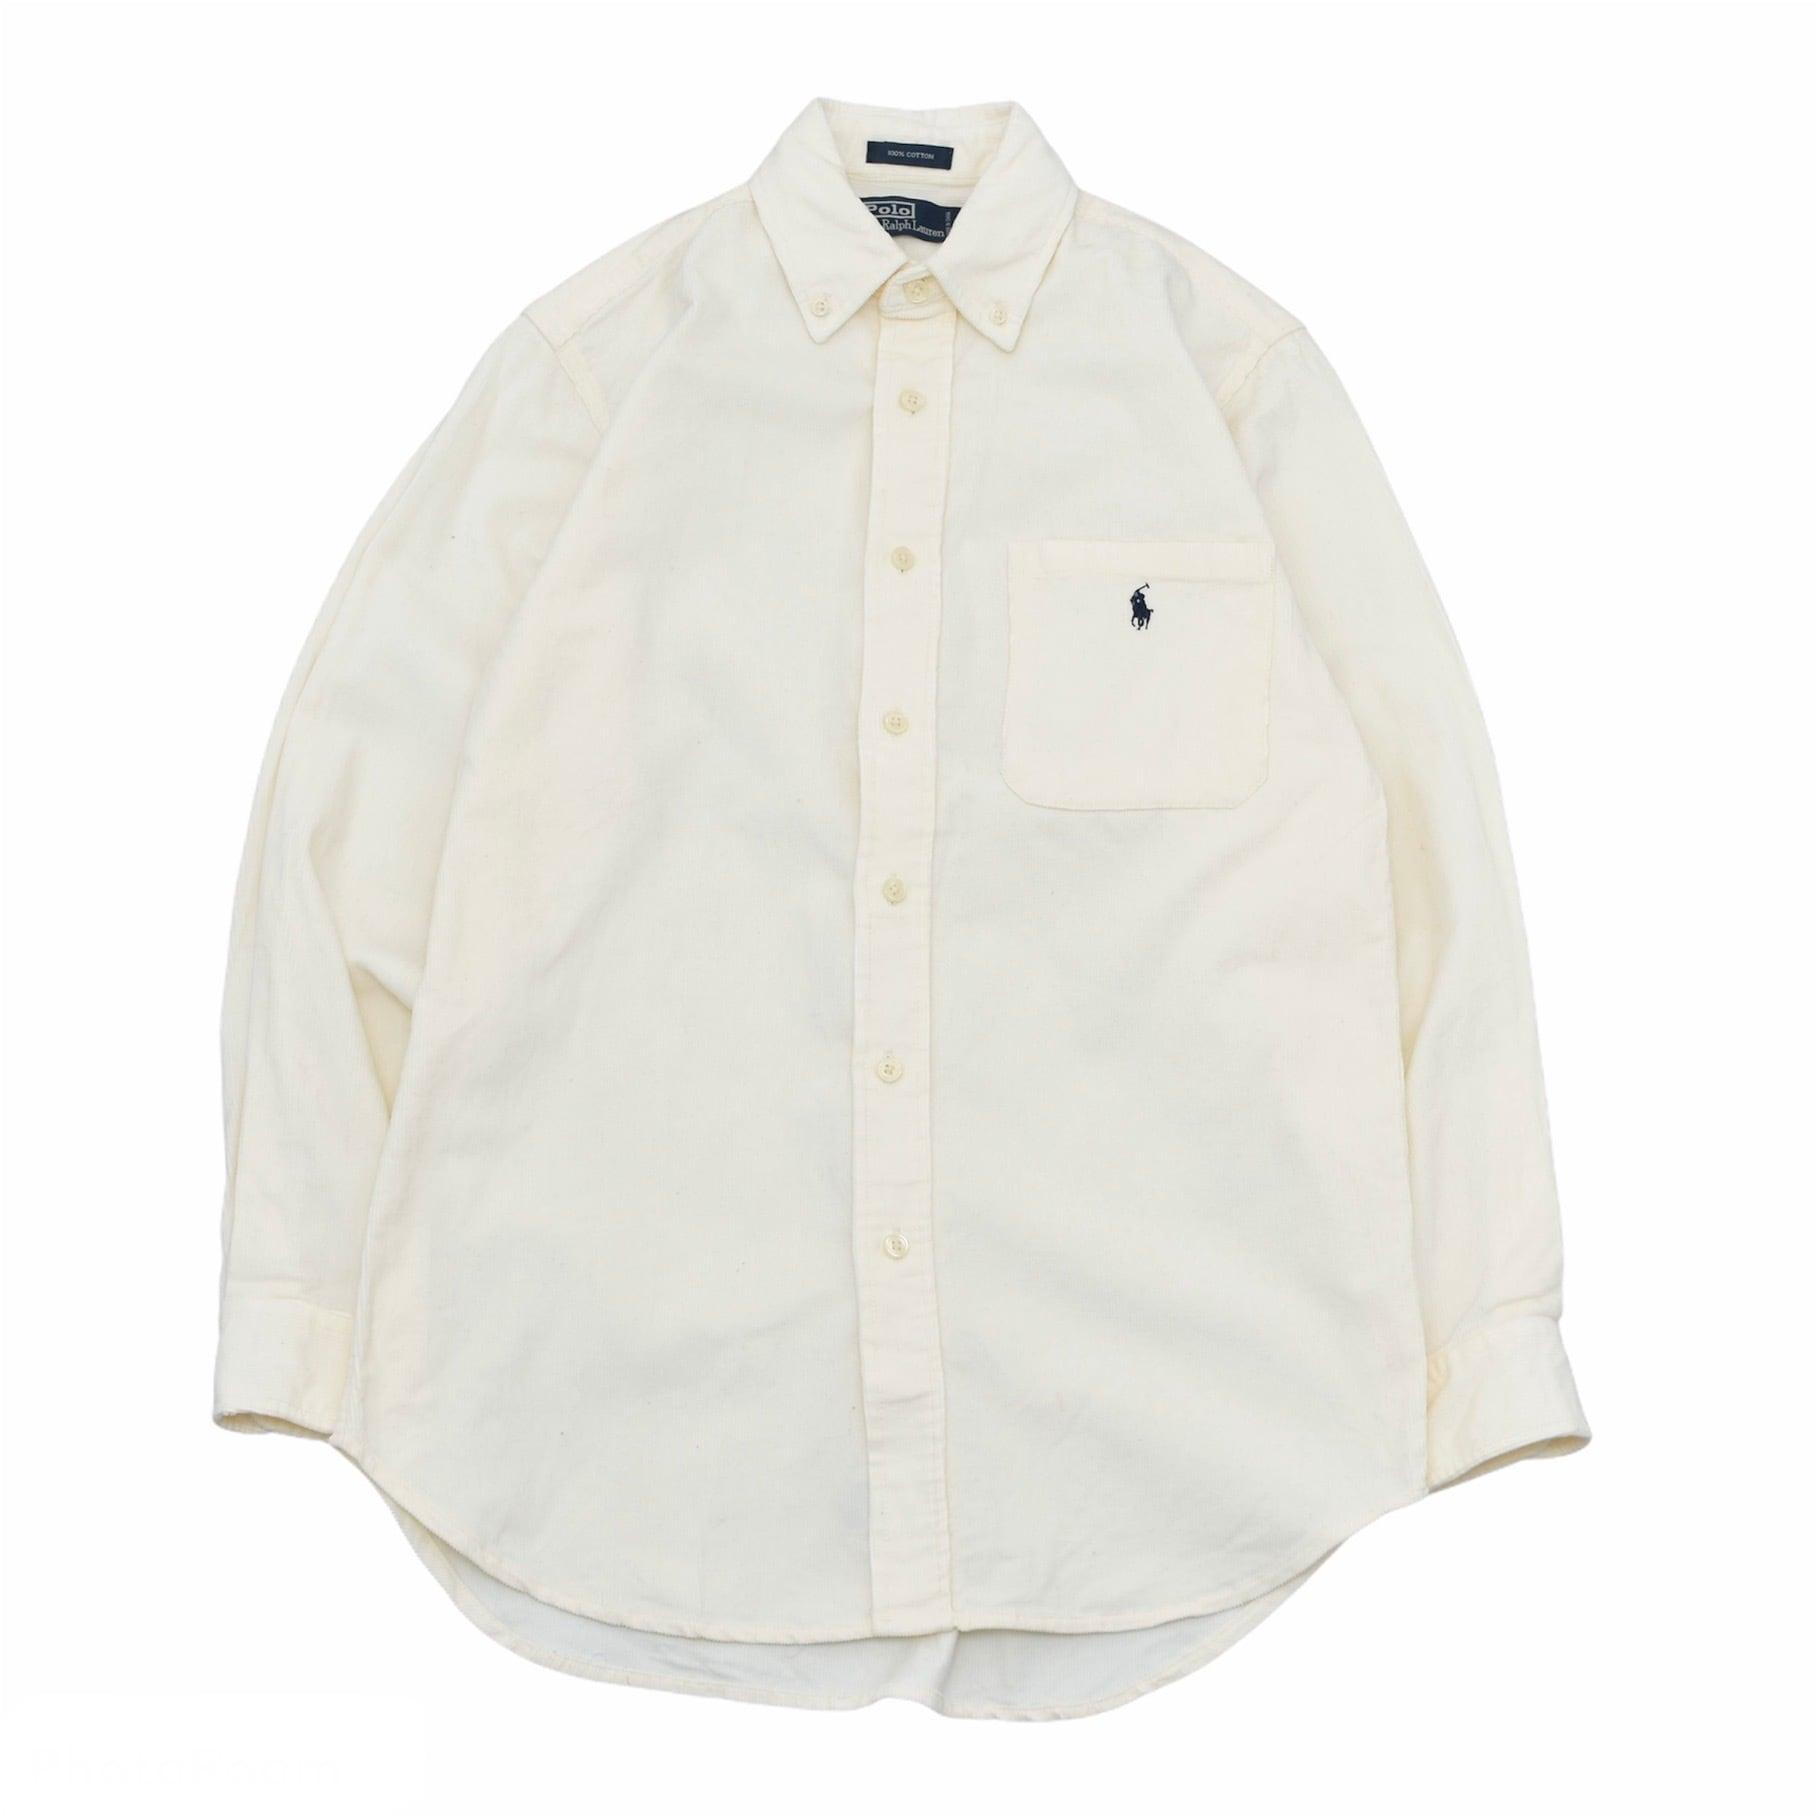 Ralph Lauren color corduroy BD shirt